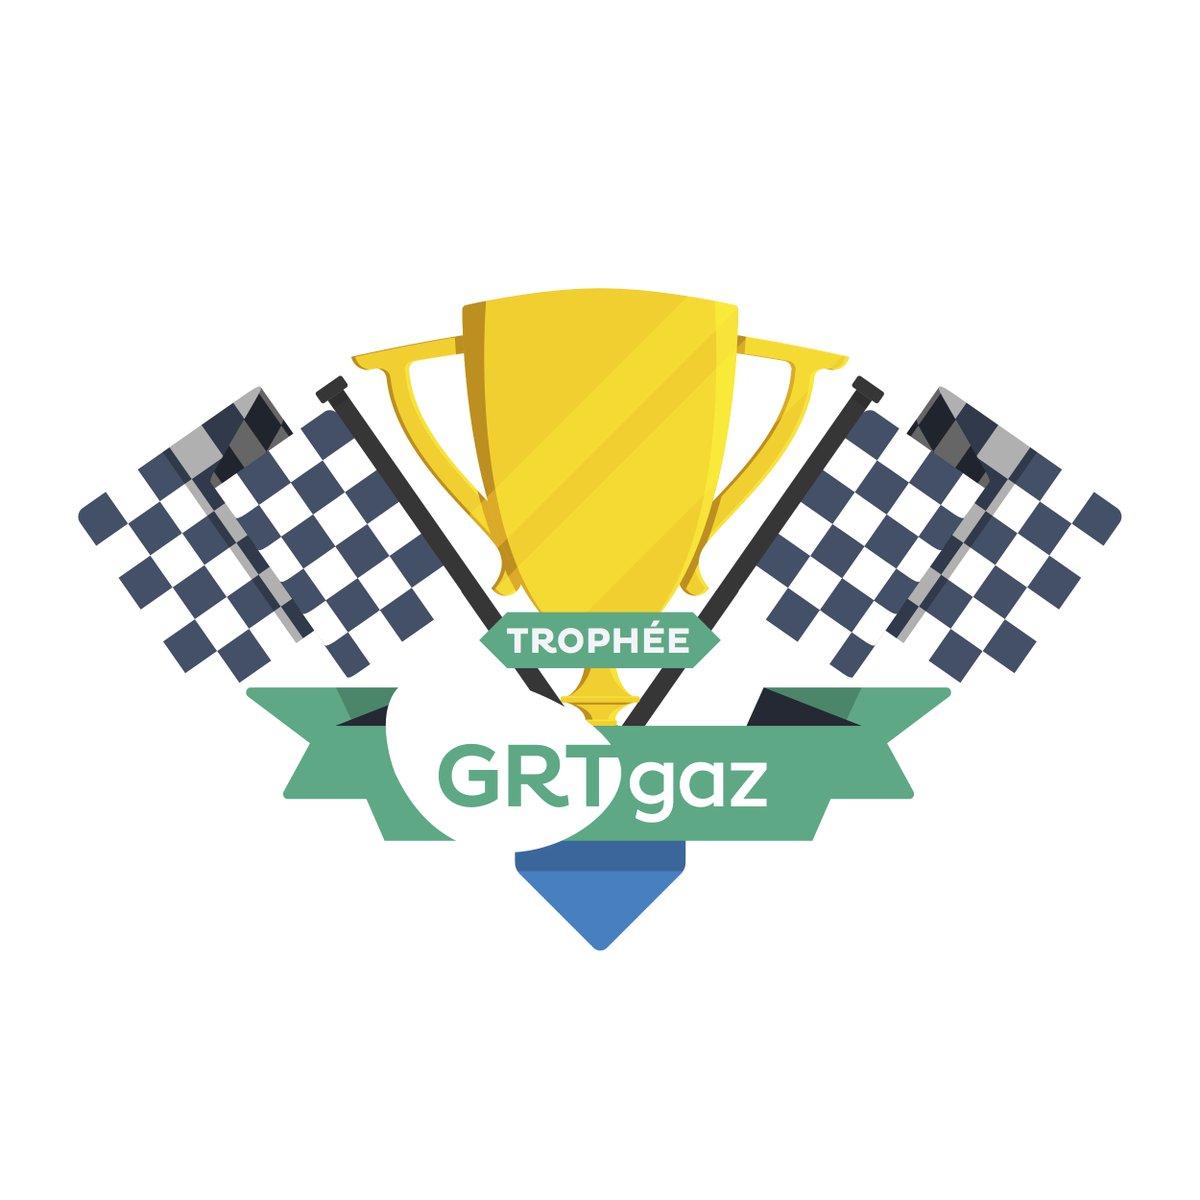 GRTgaz (@GRTgaz) Twitter # Grtgaz Bois Colombes